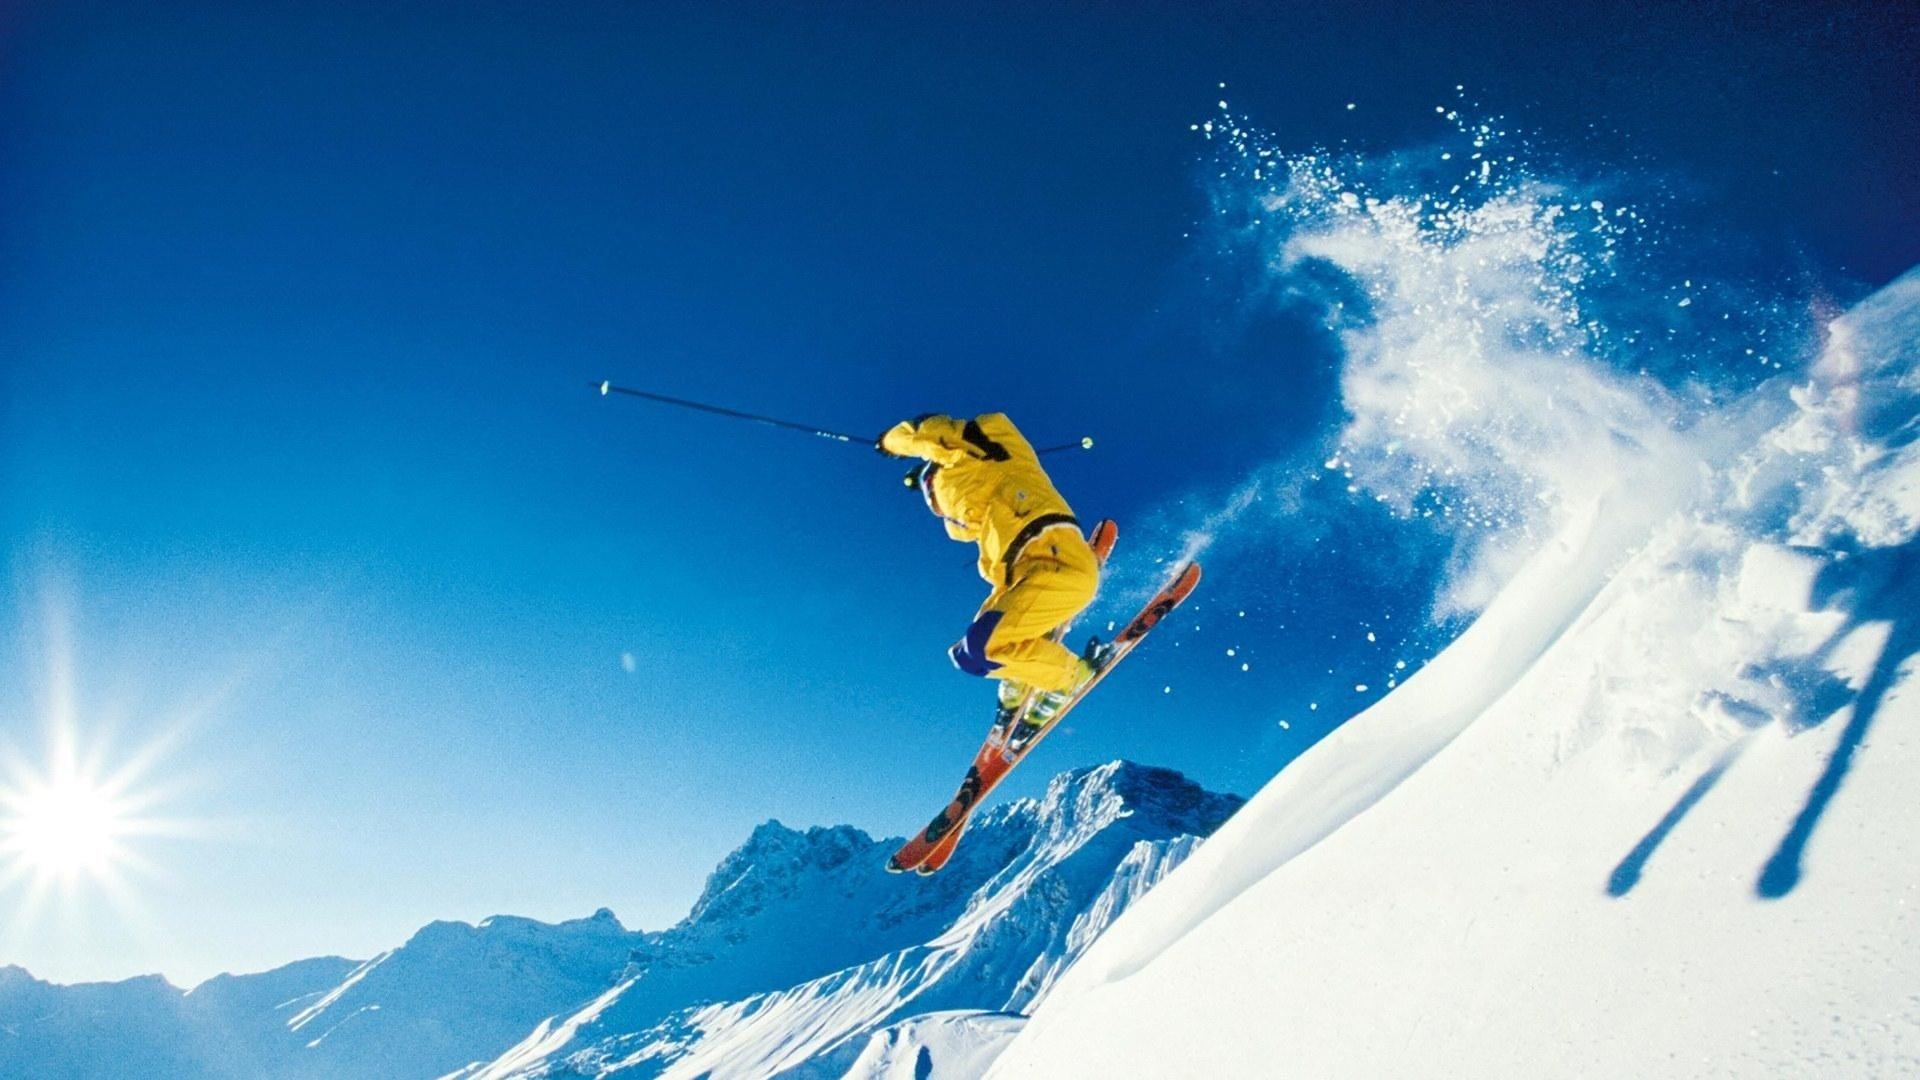 109 Skiing HD Wallpapers